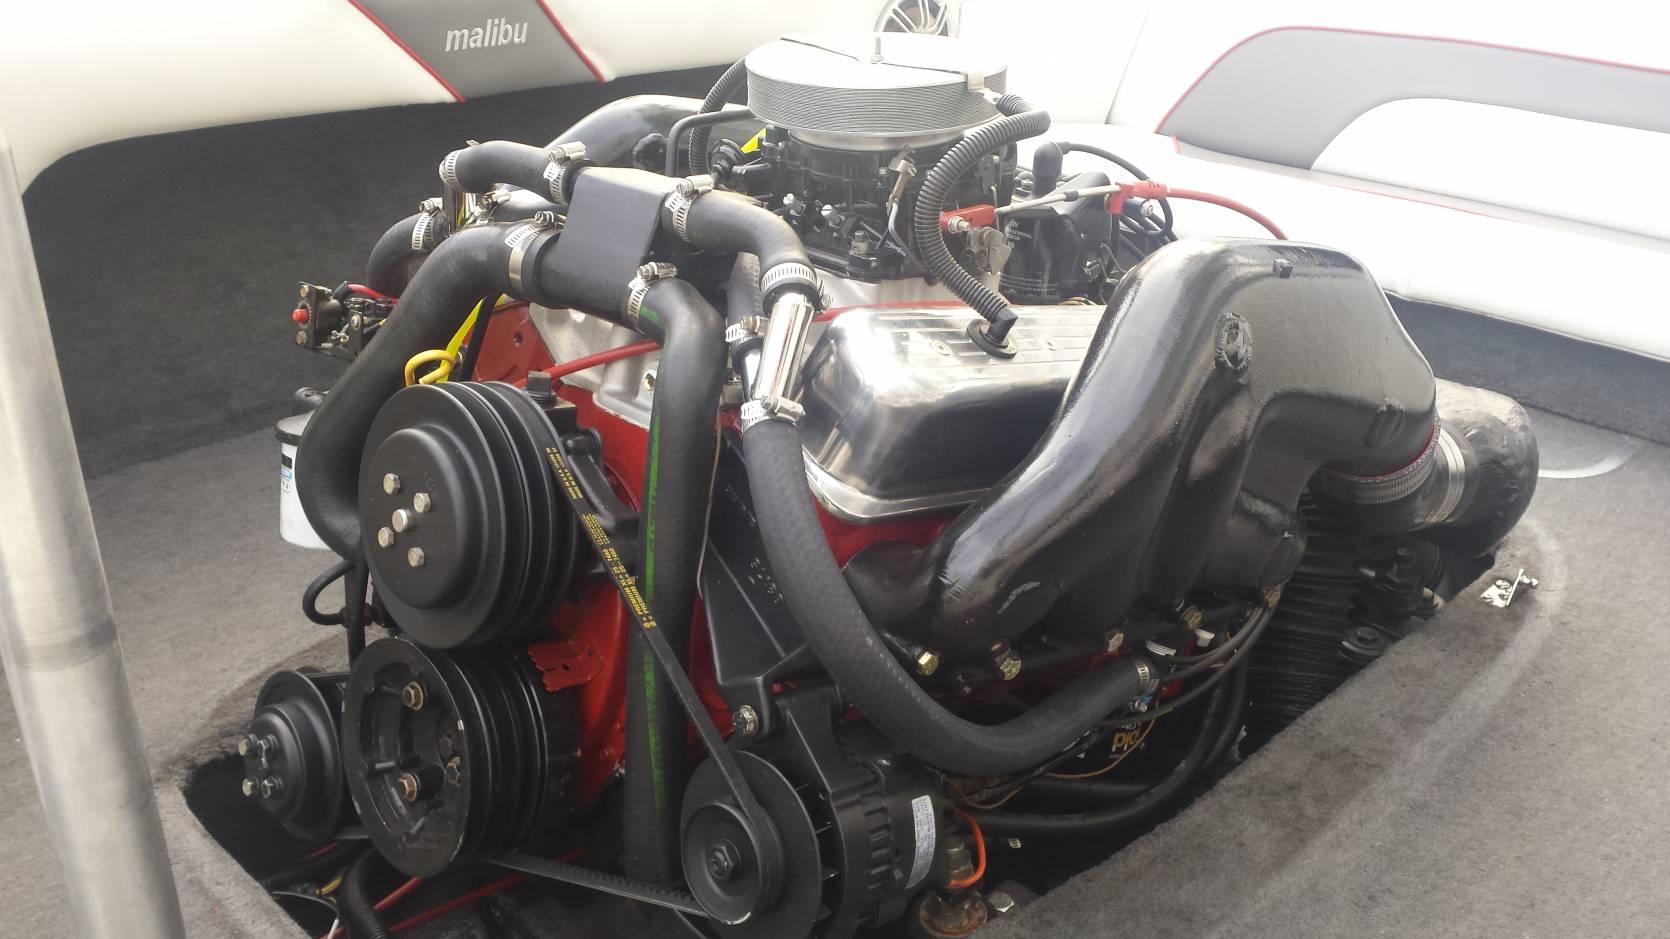 Carburetor Advice/Resource Needed